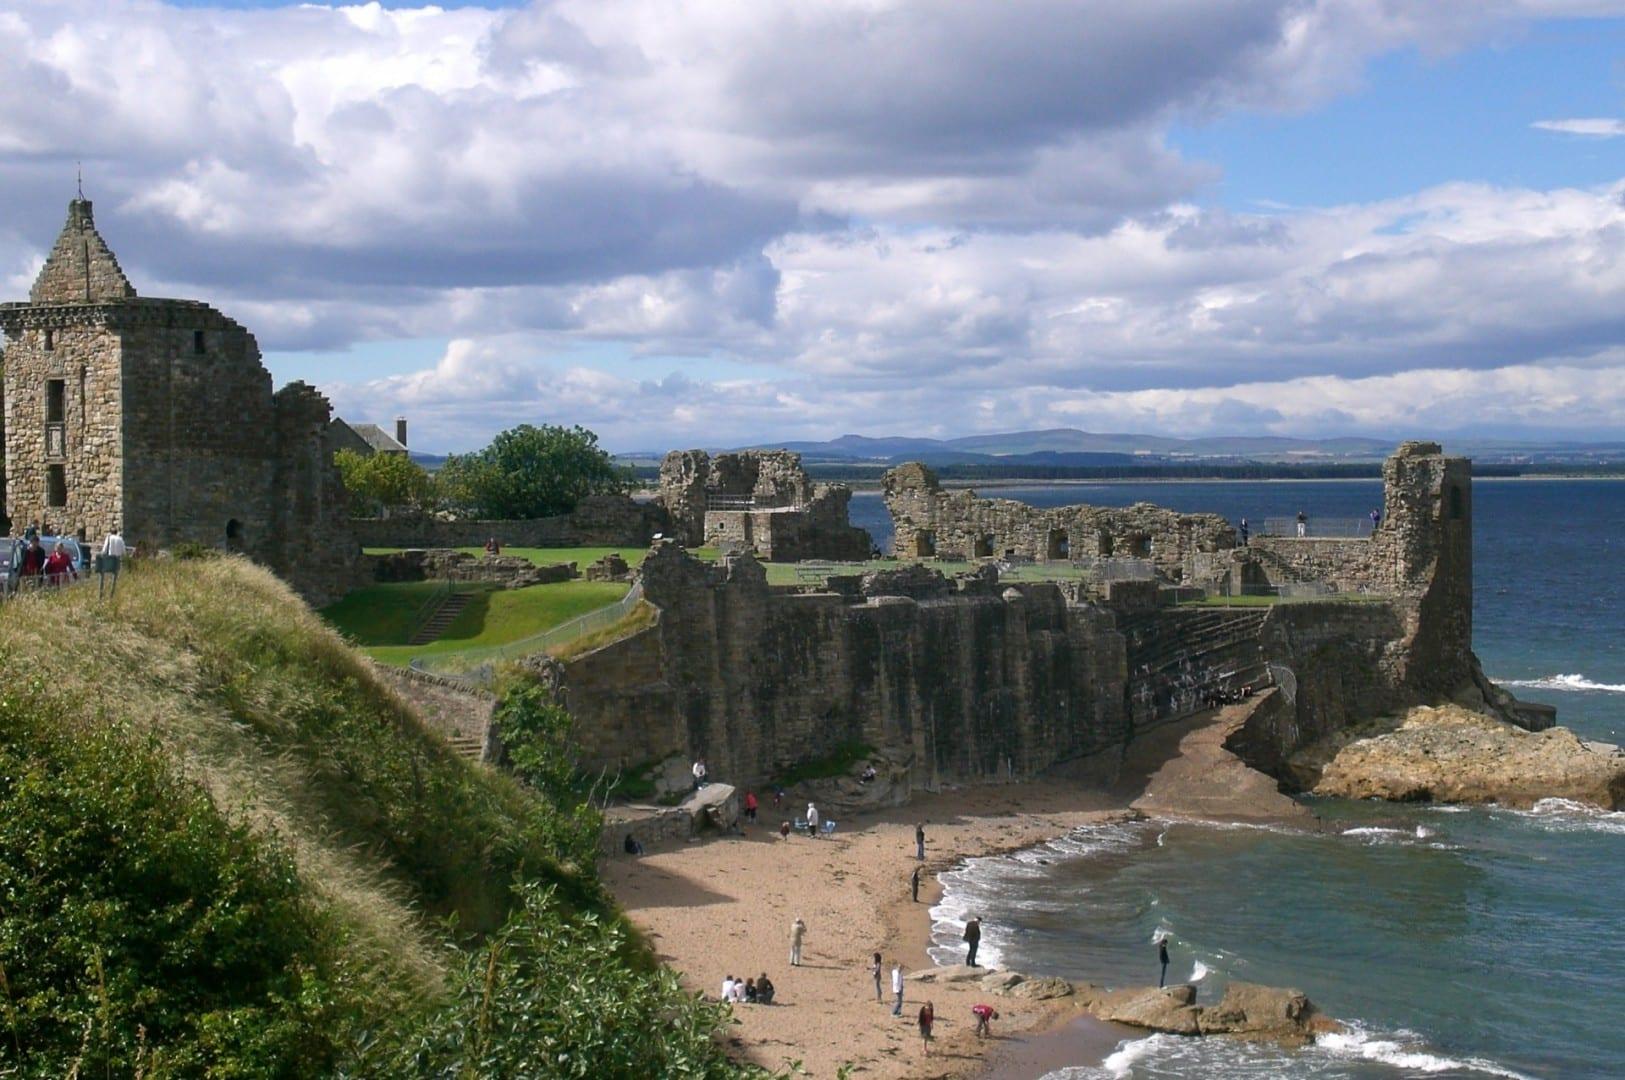 El castillo de St Andrews Saint Andrews Reino Unido